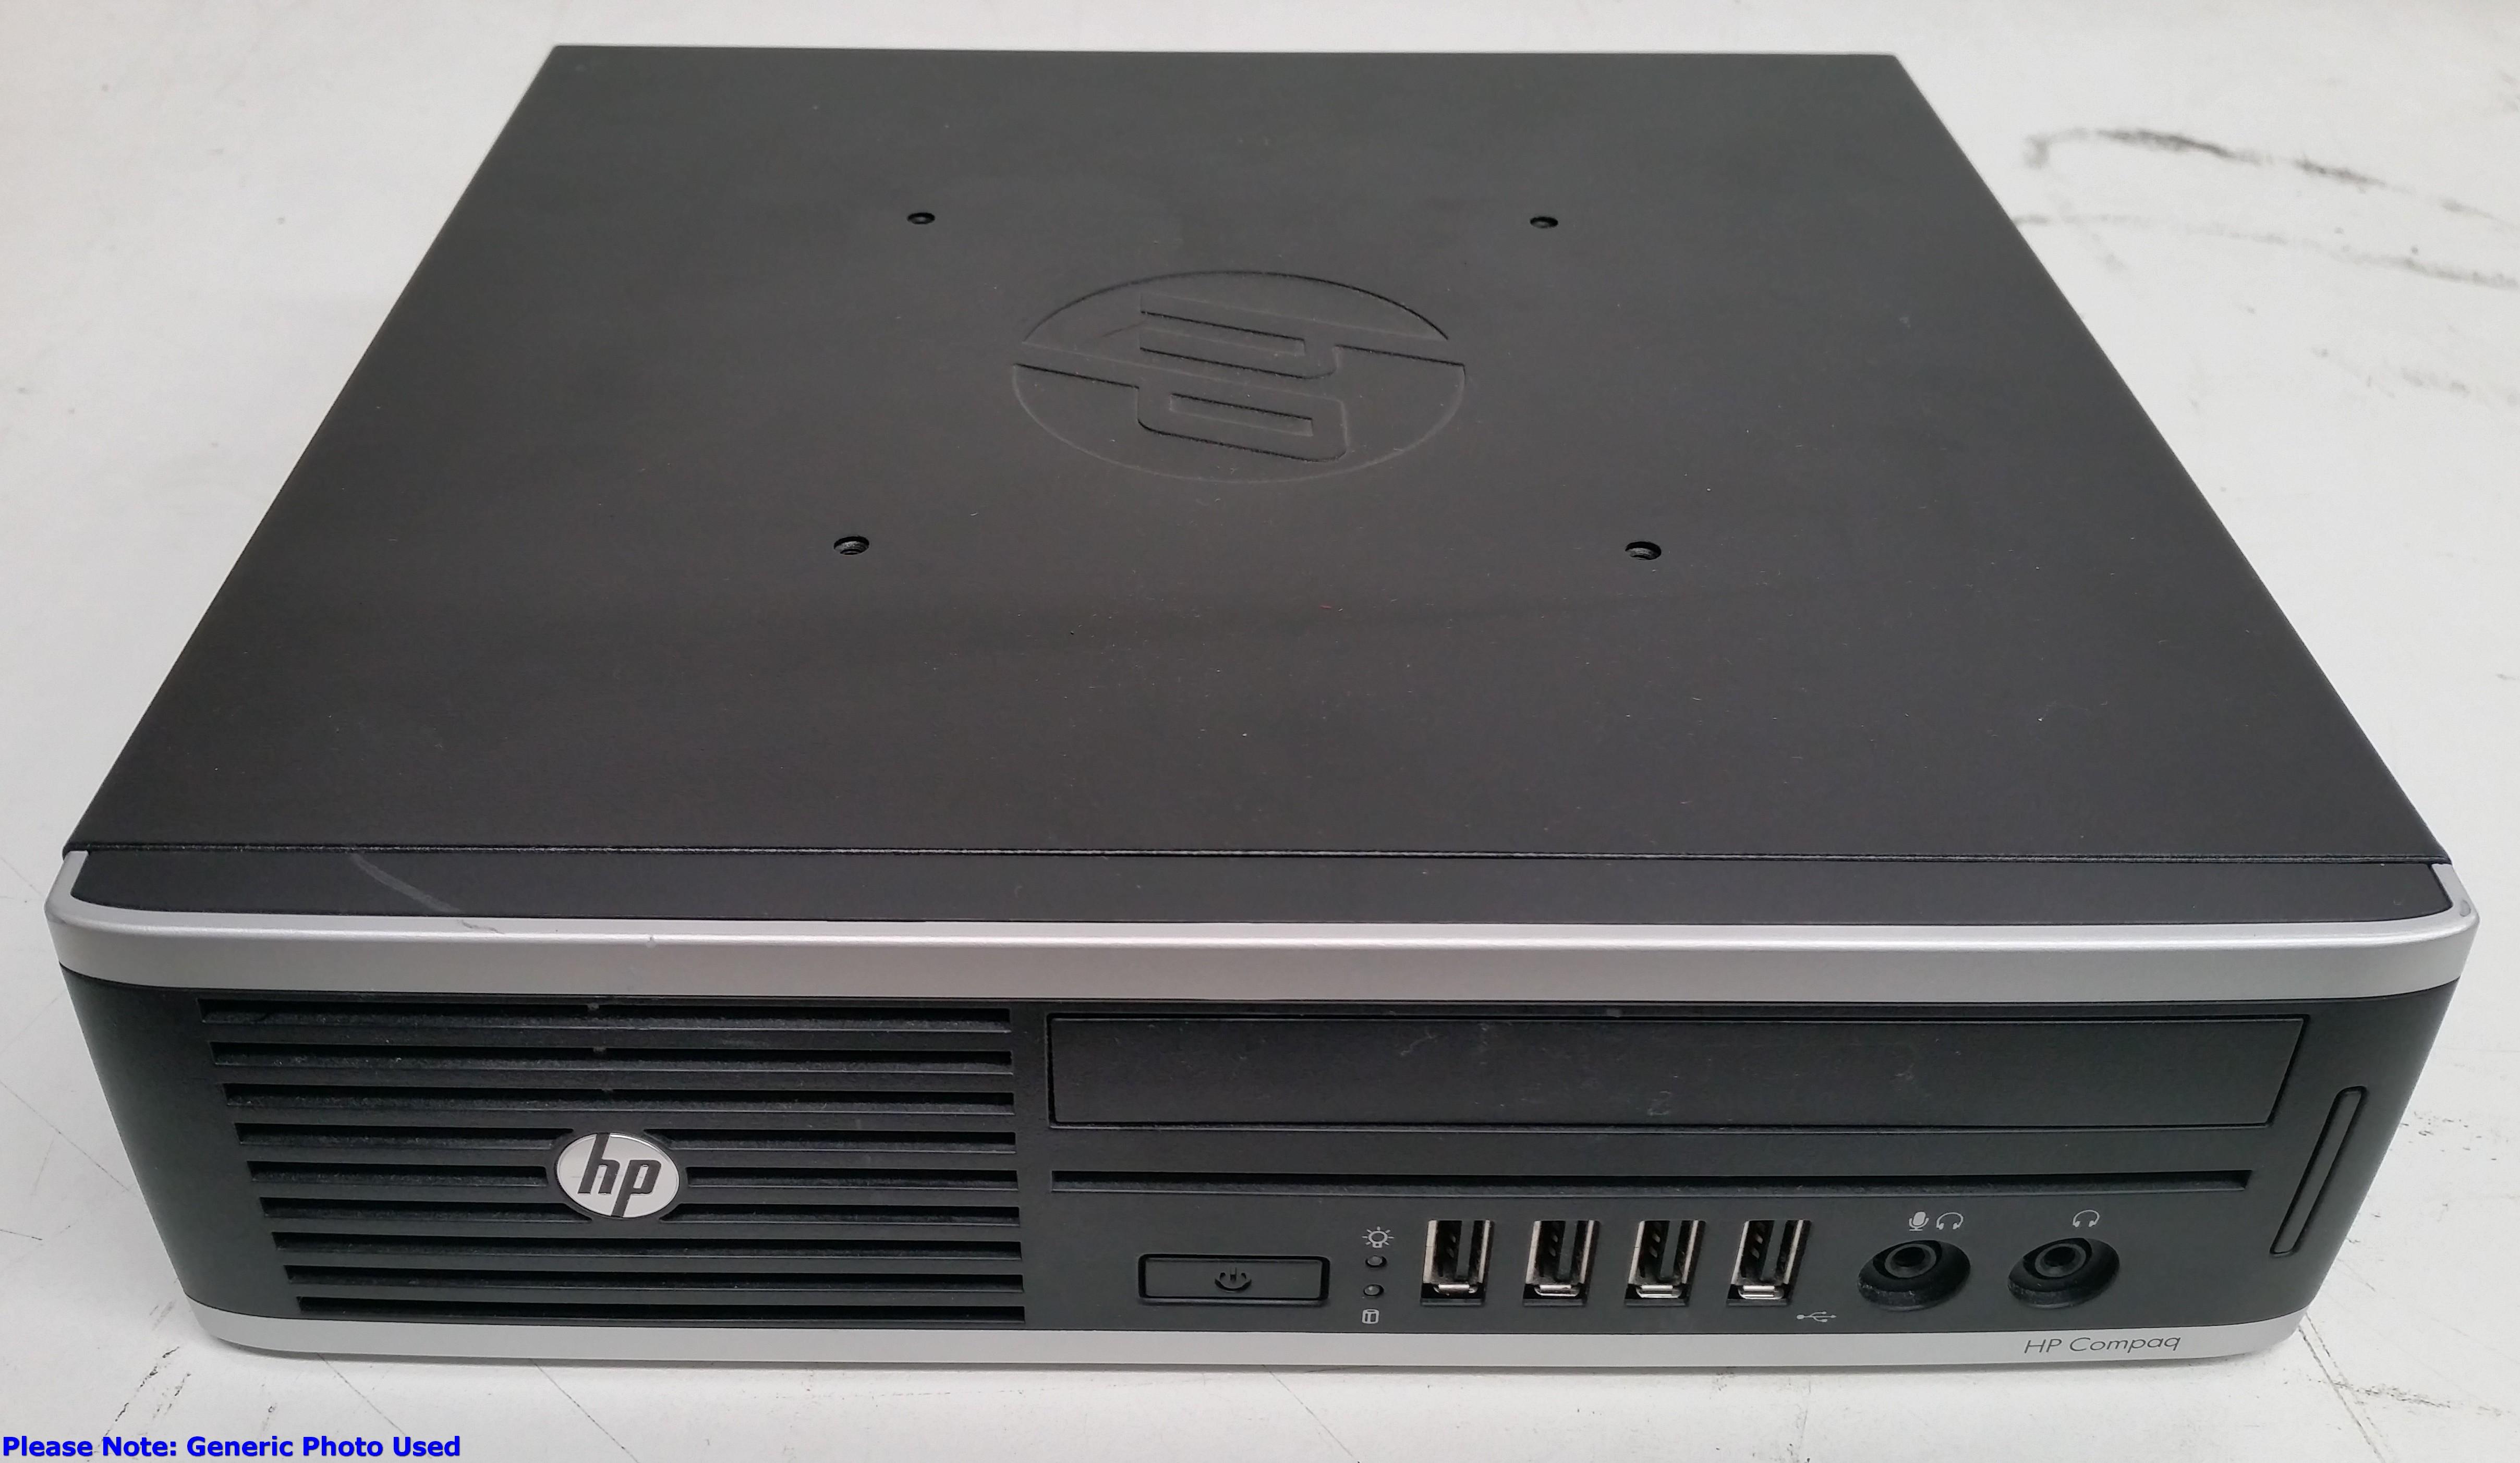 HP Compaq 8200 Elite Ultra-Slim Core i5 (2500S) 2 70GHz Desktop Computer